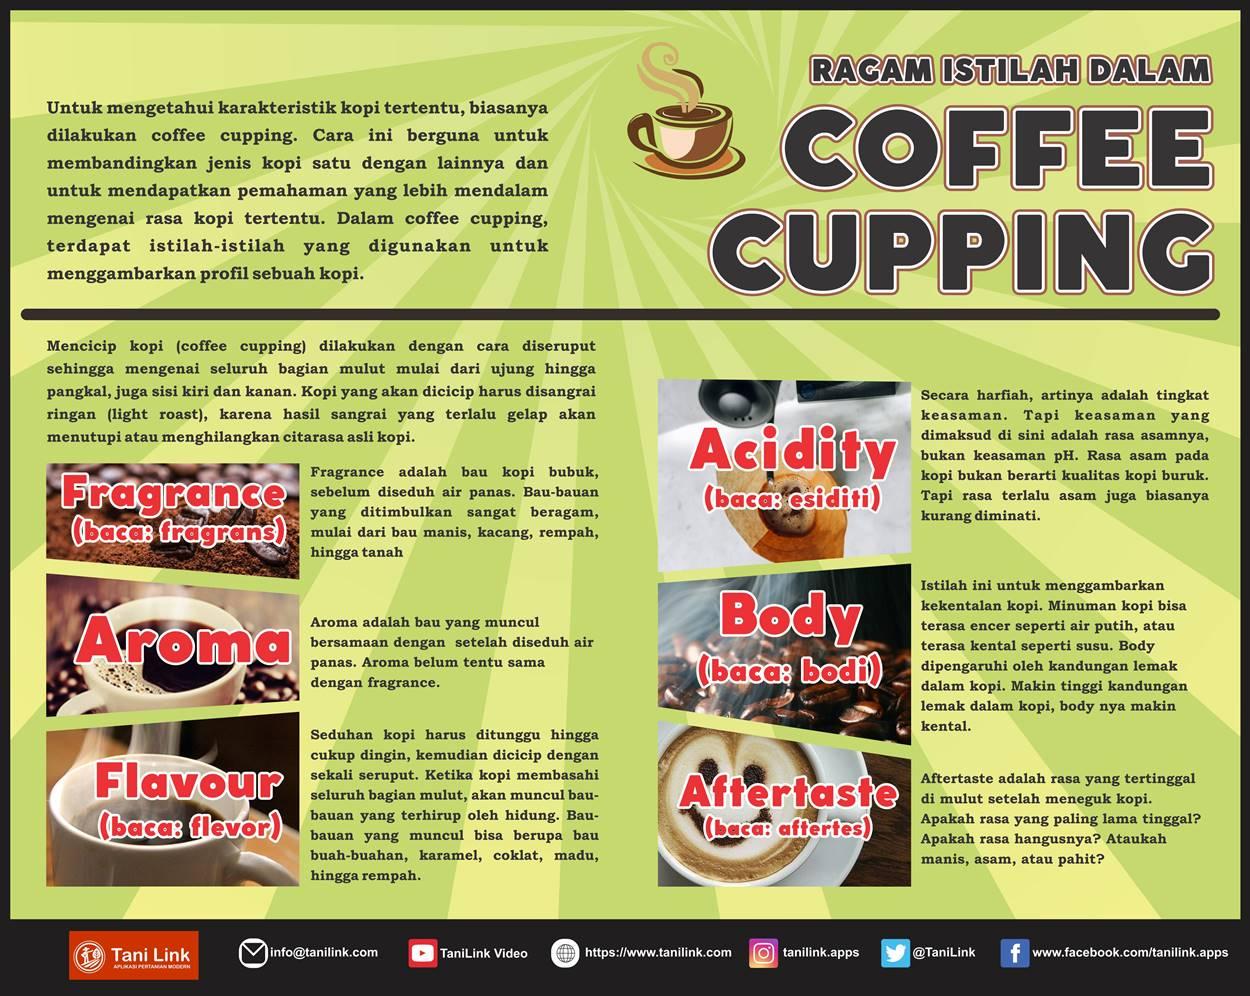 INFOGRAFIS : Ragam Istilah Dalam Coffee Cupping